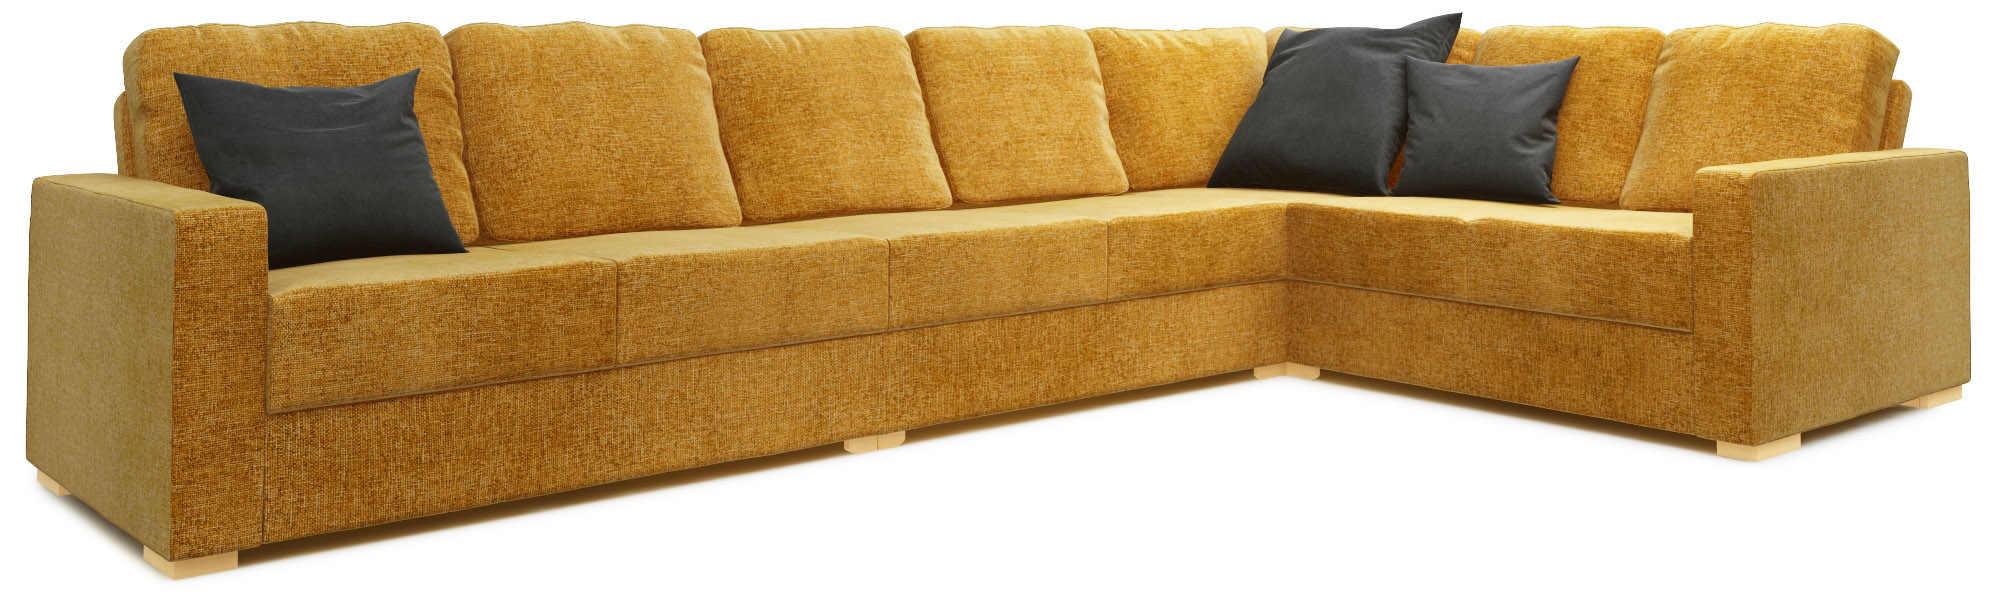 Lear 5X3 Corner Sofa